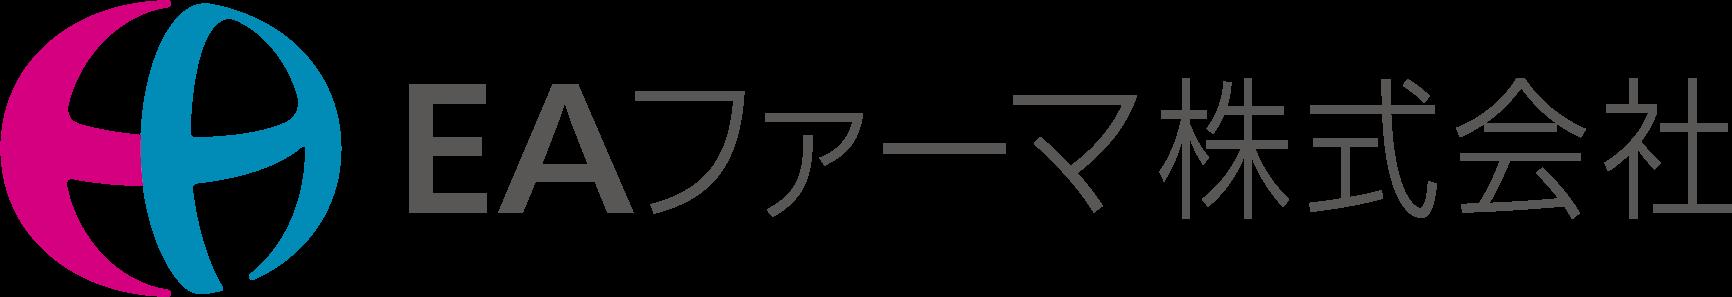 COMPANY news EAファーマ株式会社